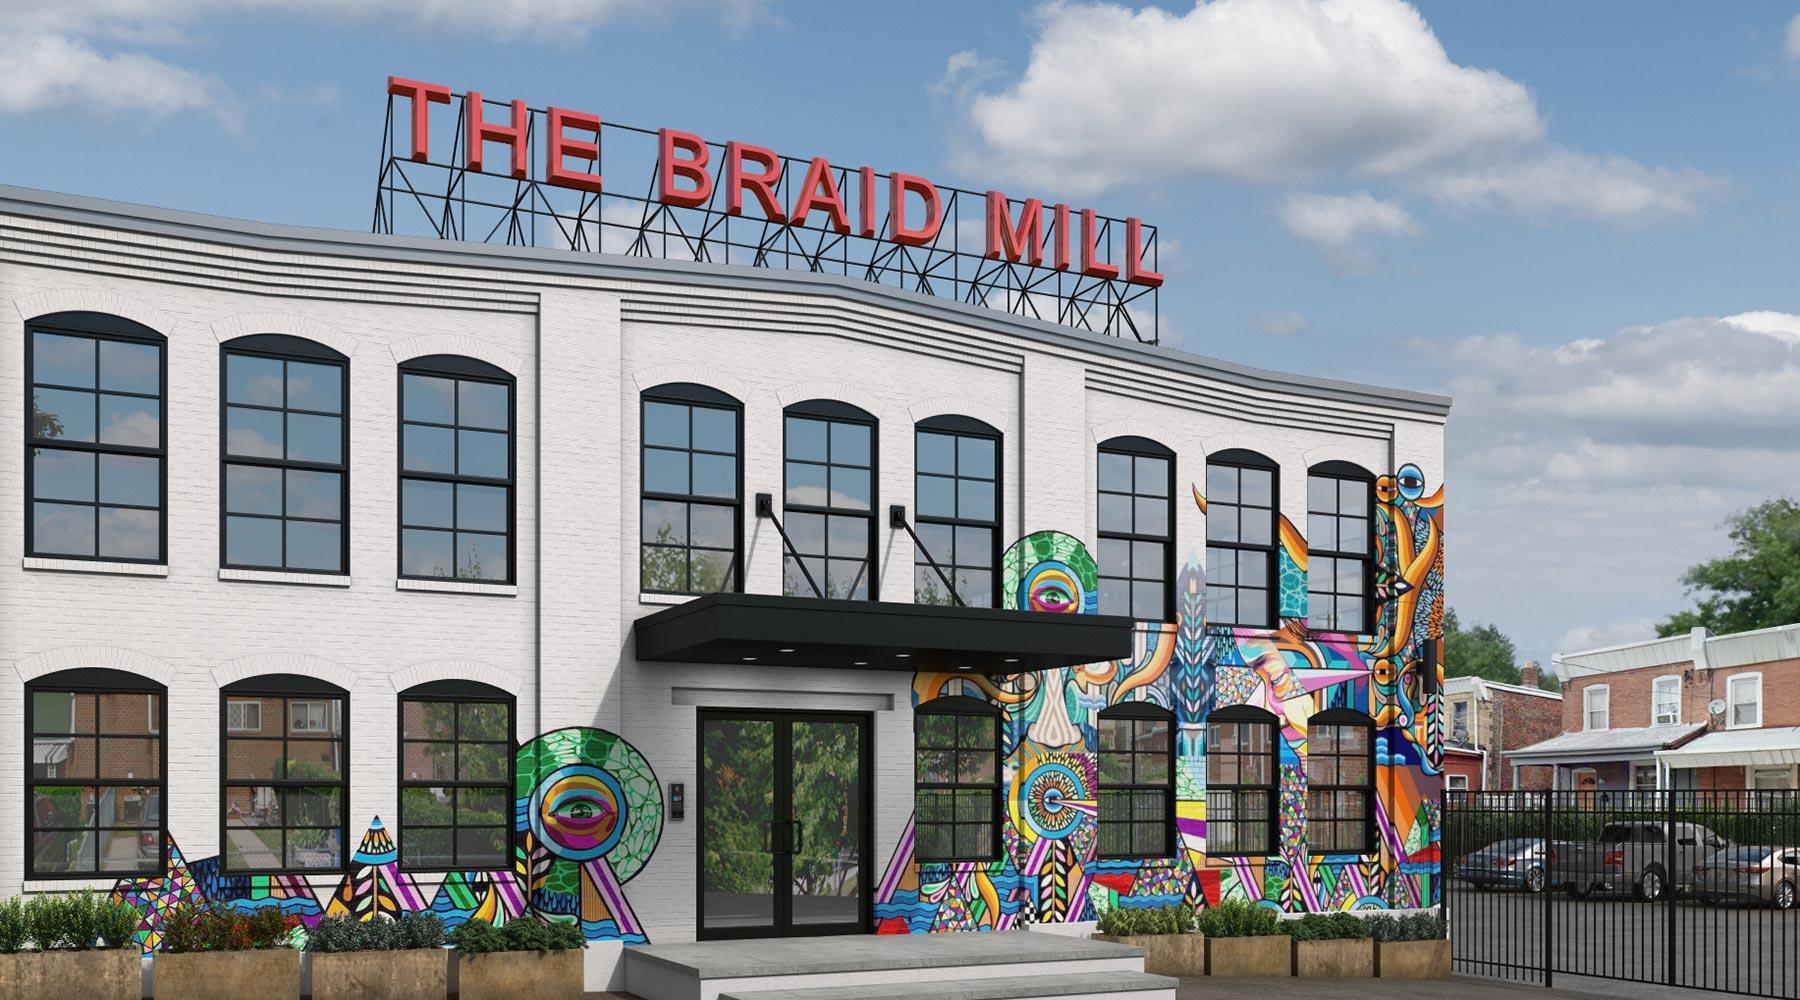 The Braid Mill